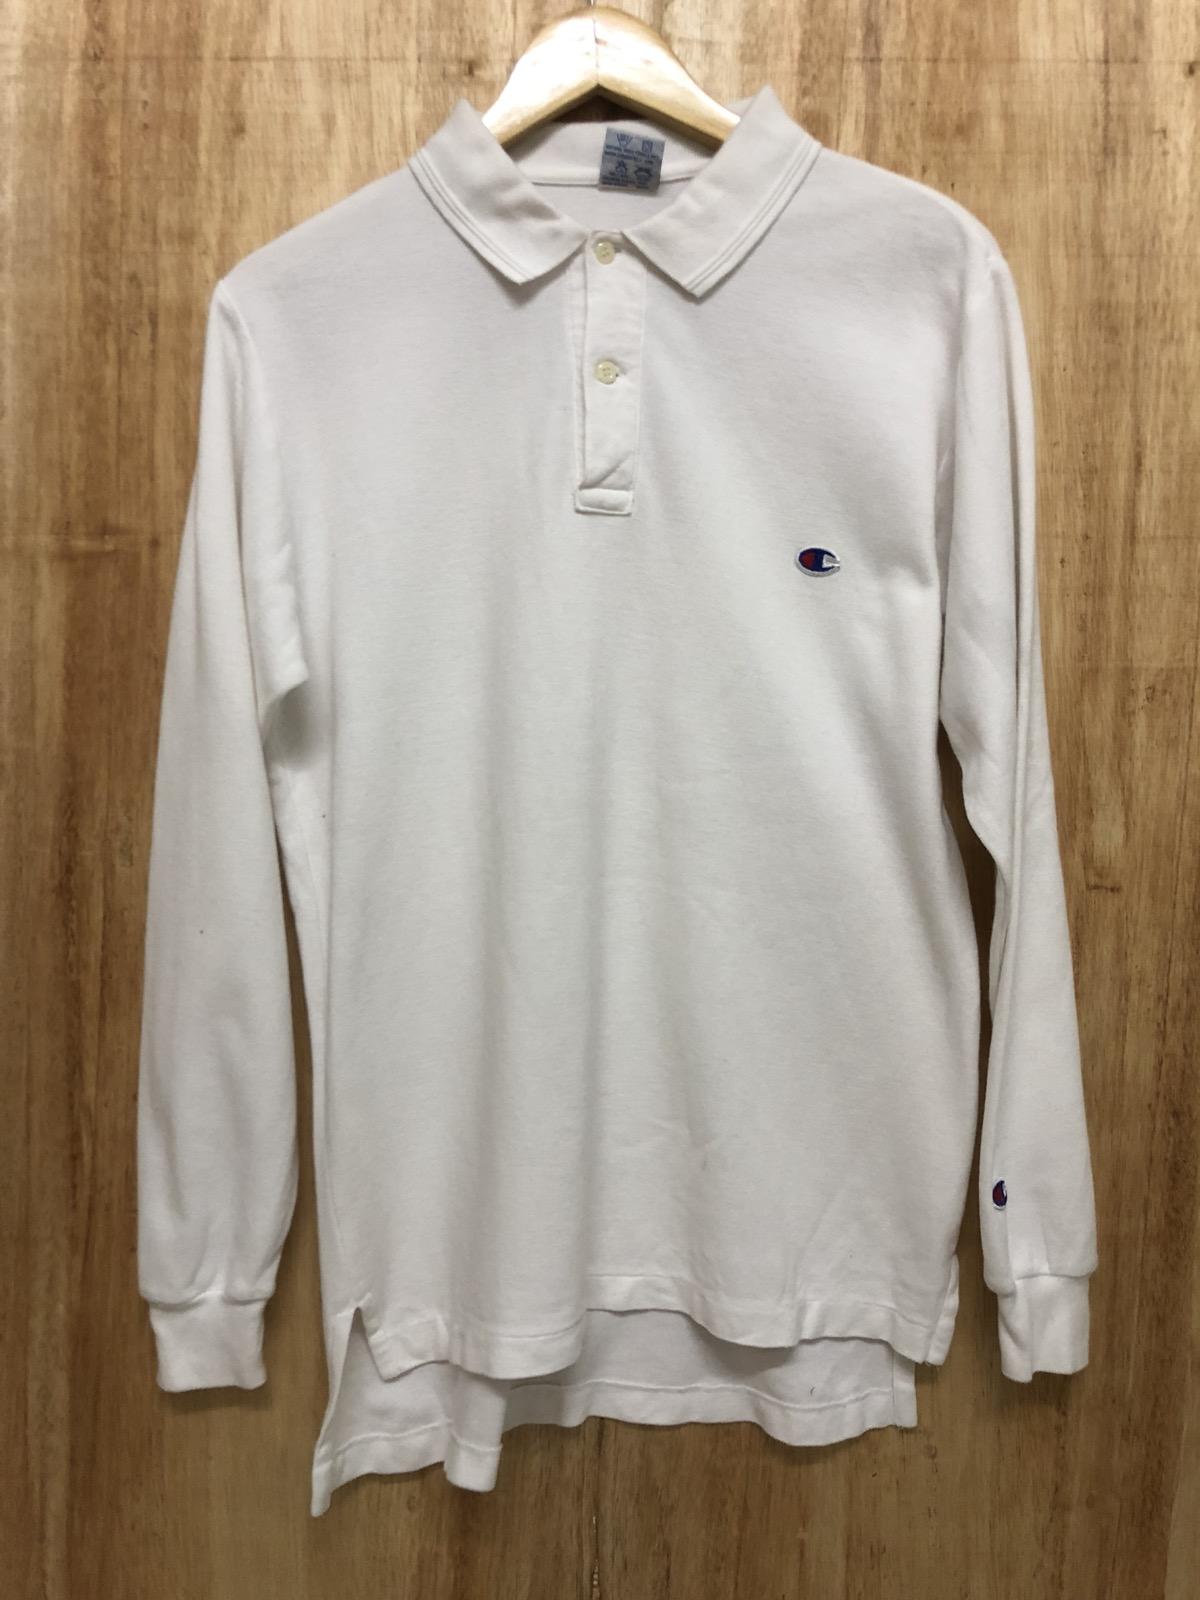 023f8746 Champion Vintage Champion Long Sleeve Polo Shirt | Grailed